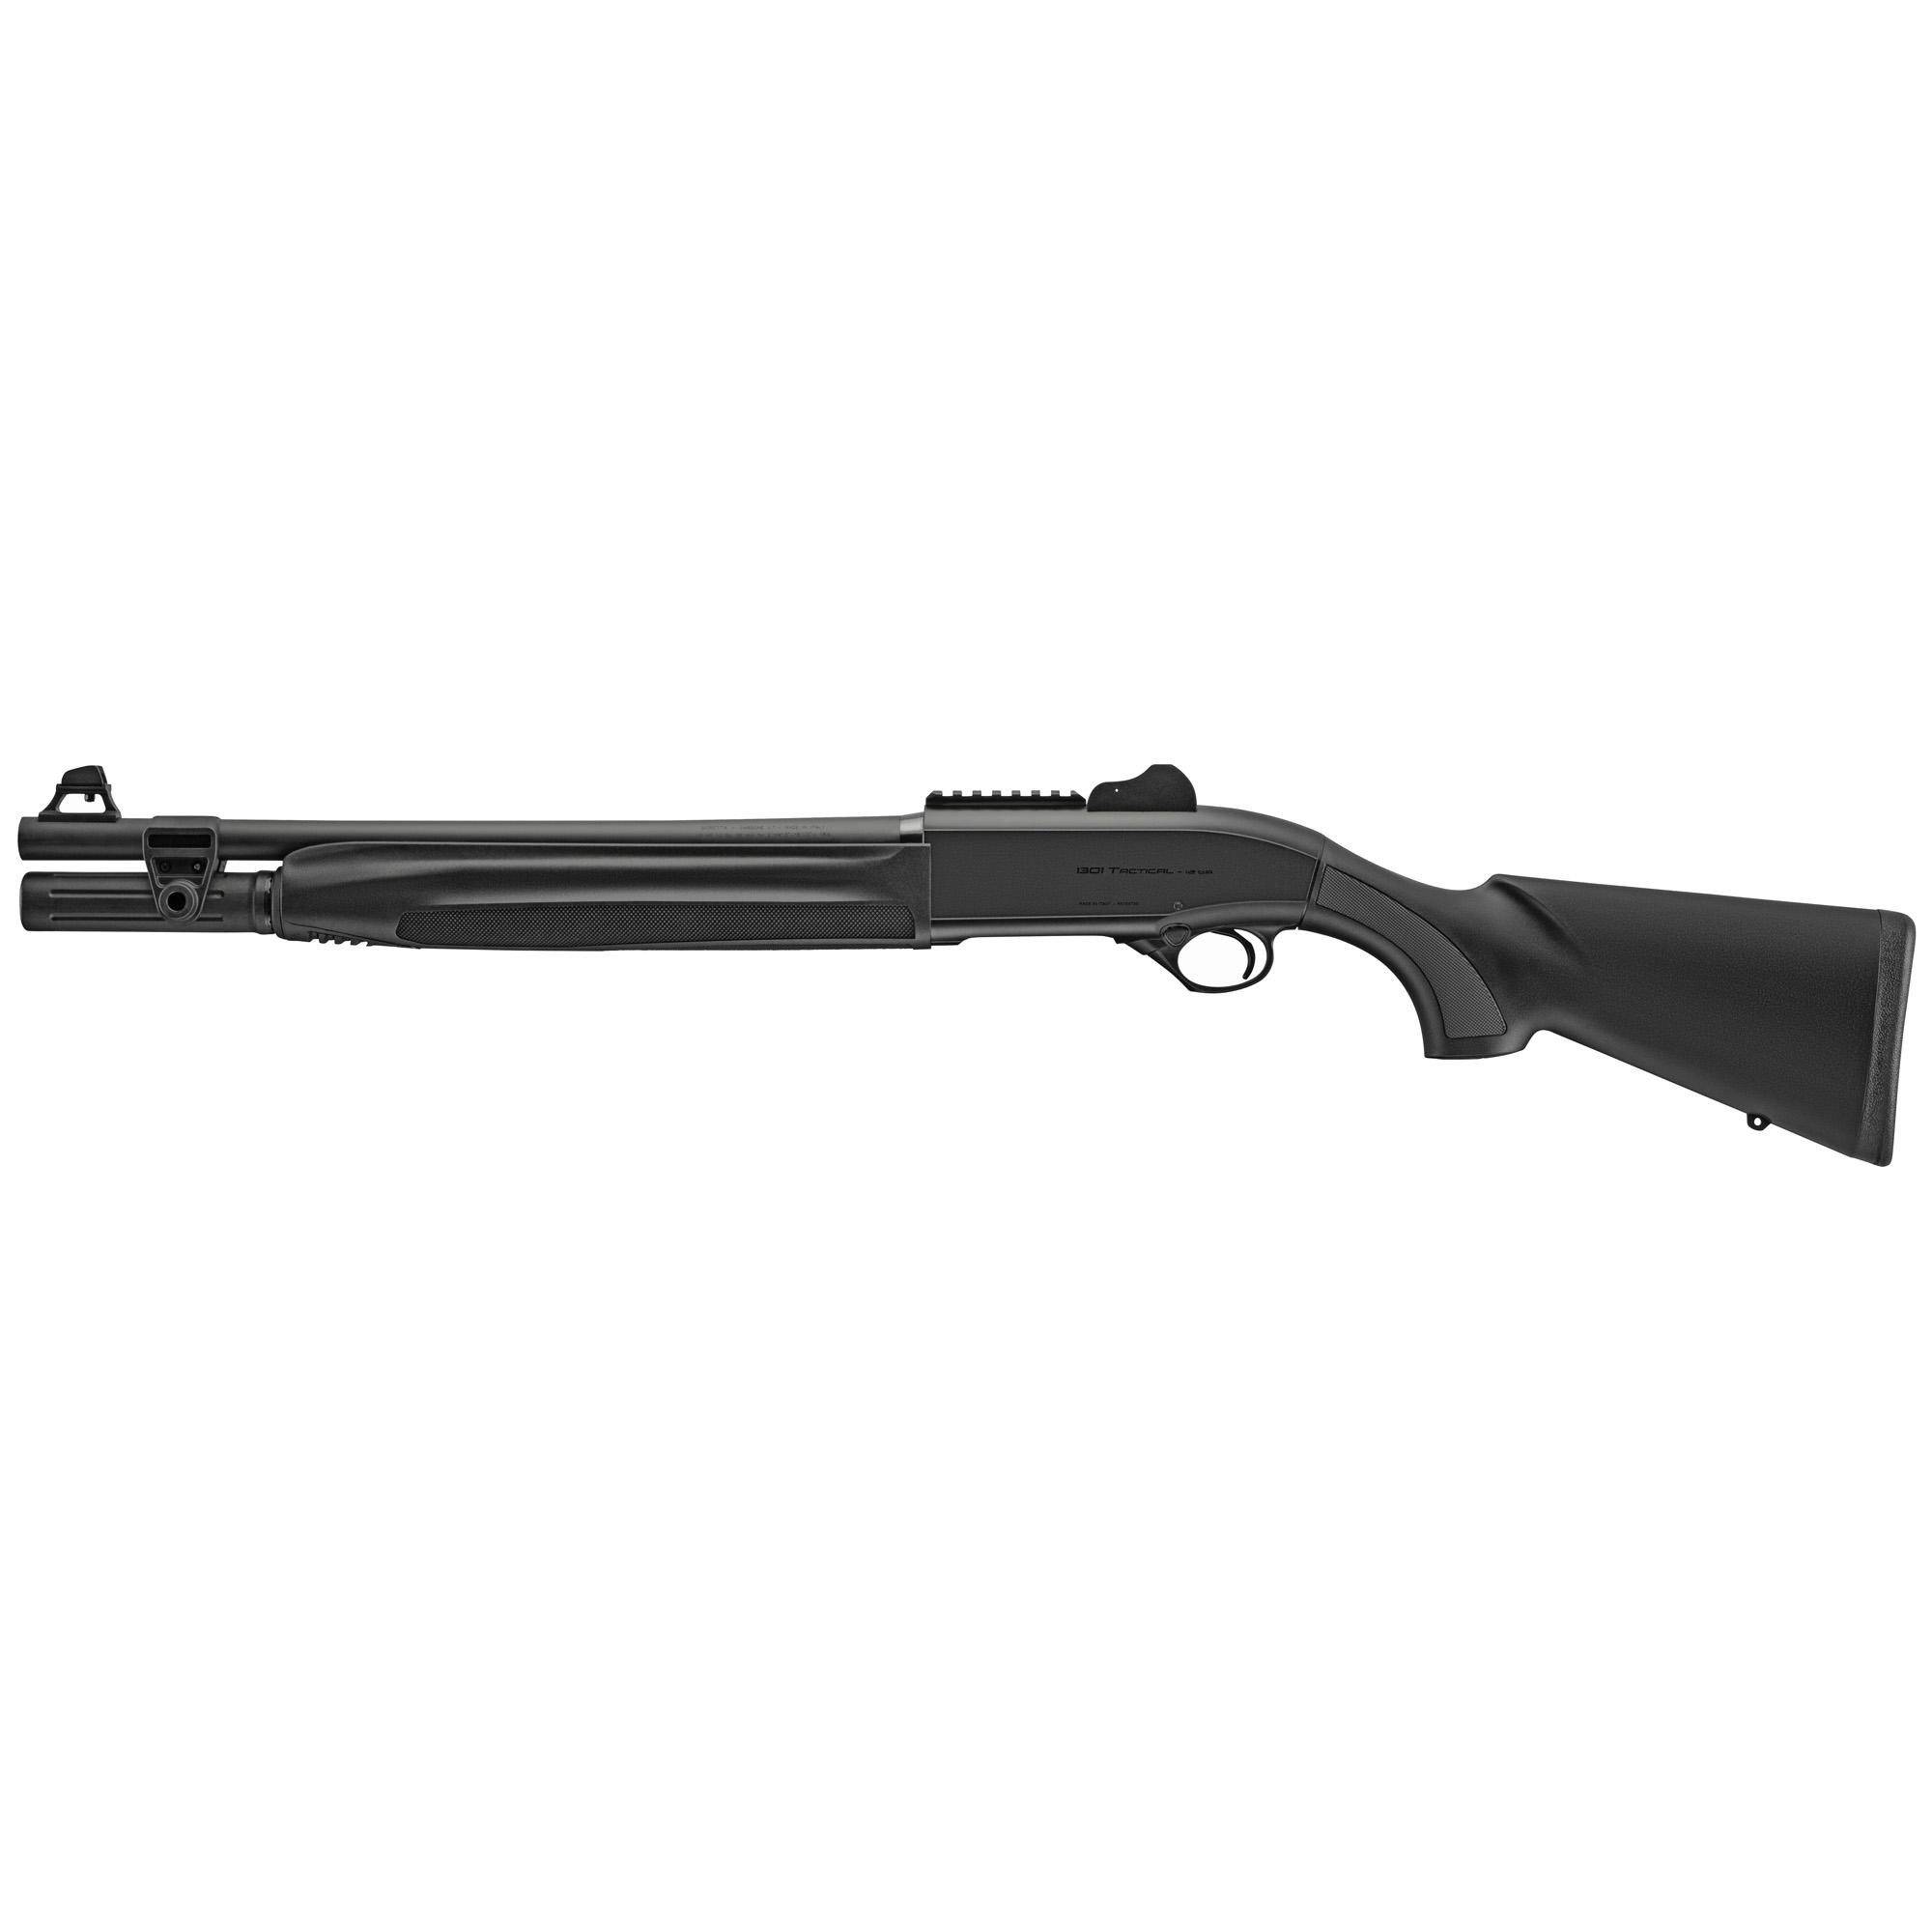 "Beretta 1301 Tac 12ga 18.5"" 7rd Blem"